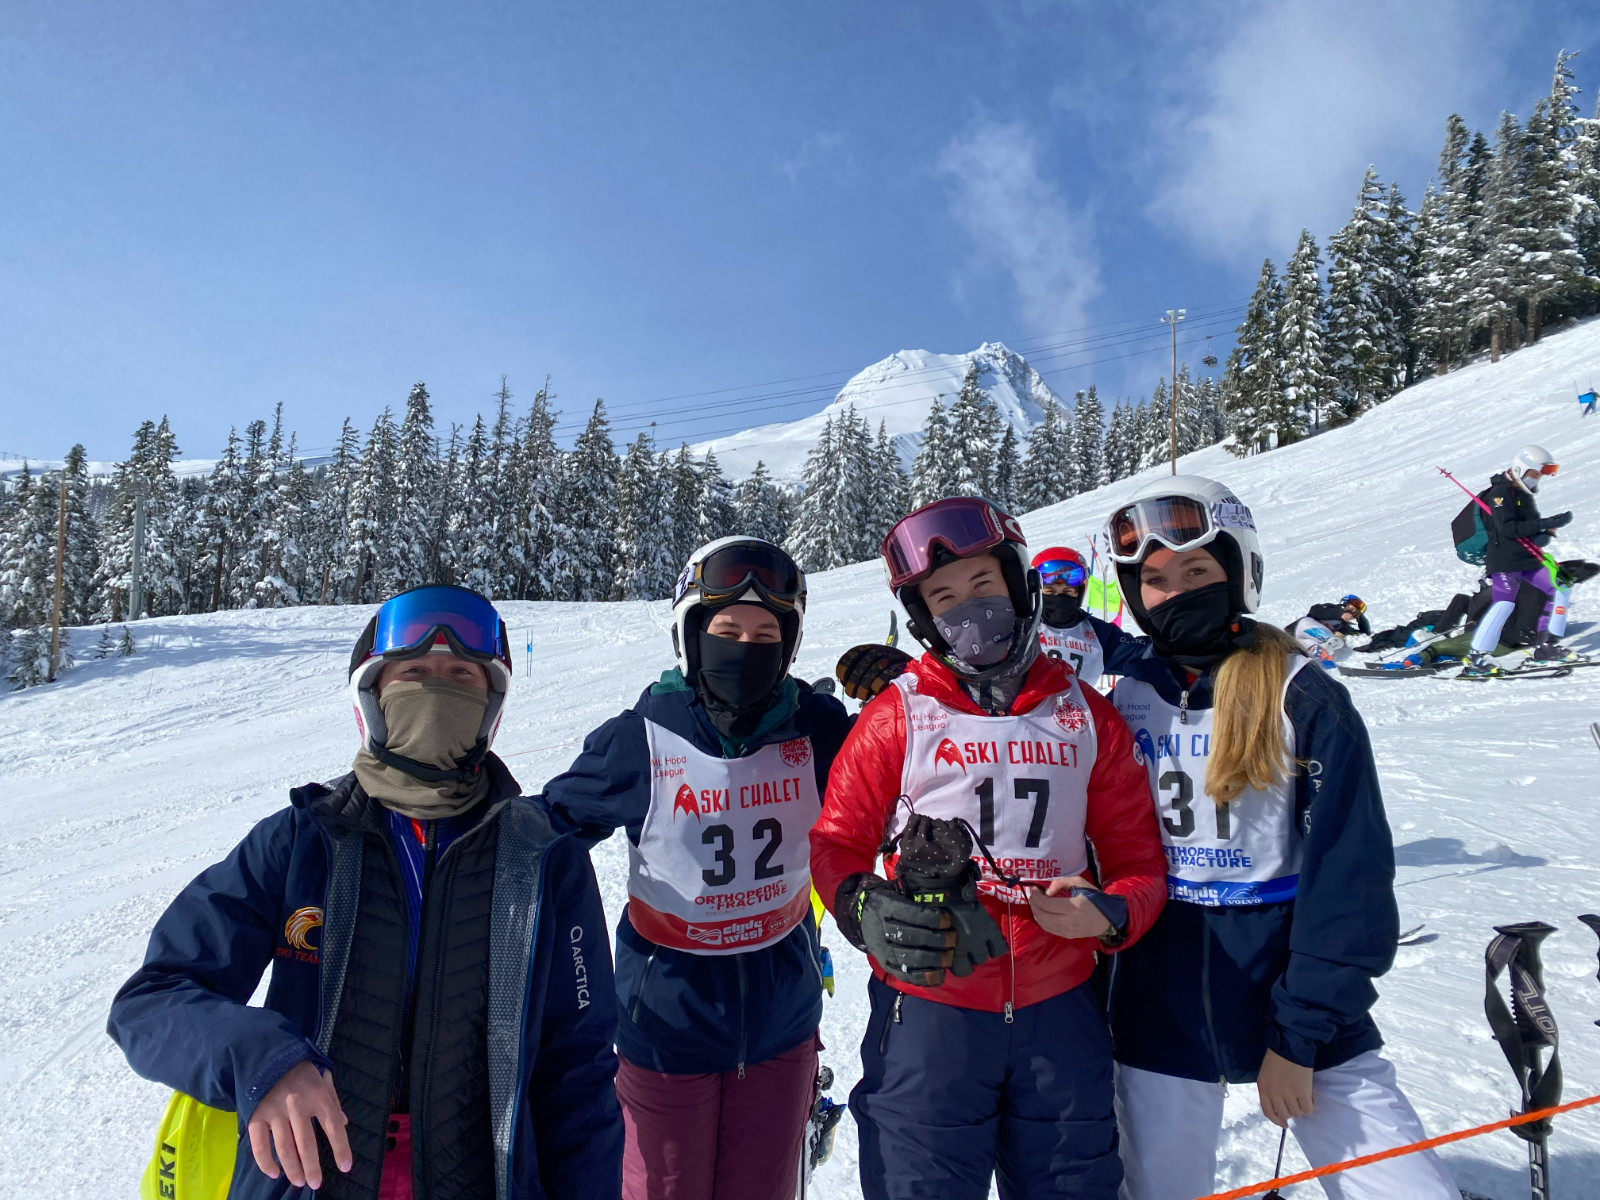 Riverhawk Ski Team 2021 Mt. Hood Meadows 2/17/21